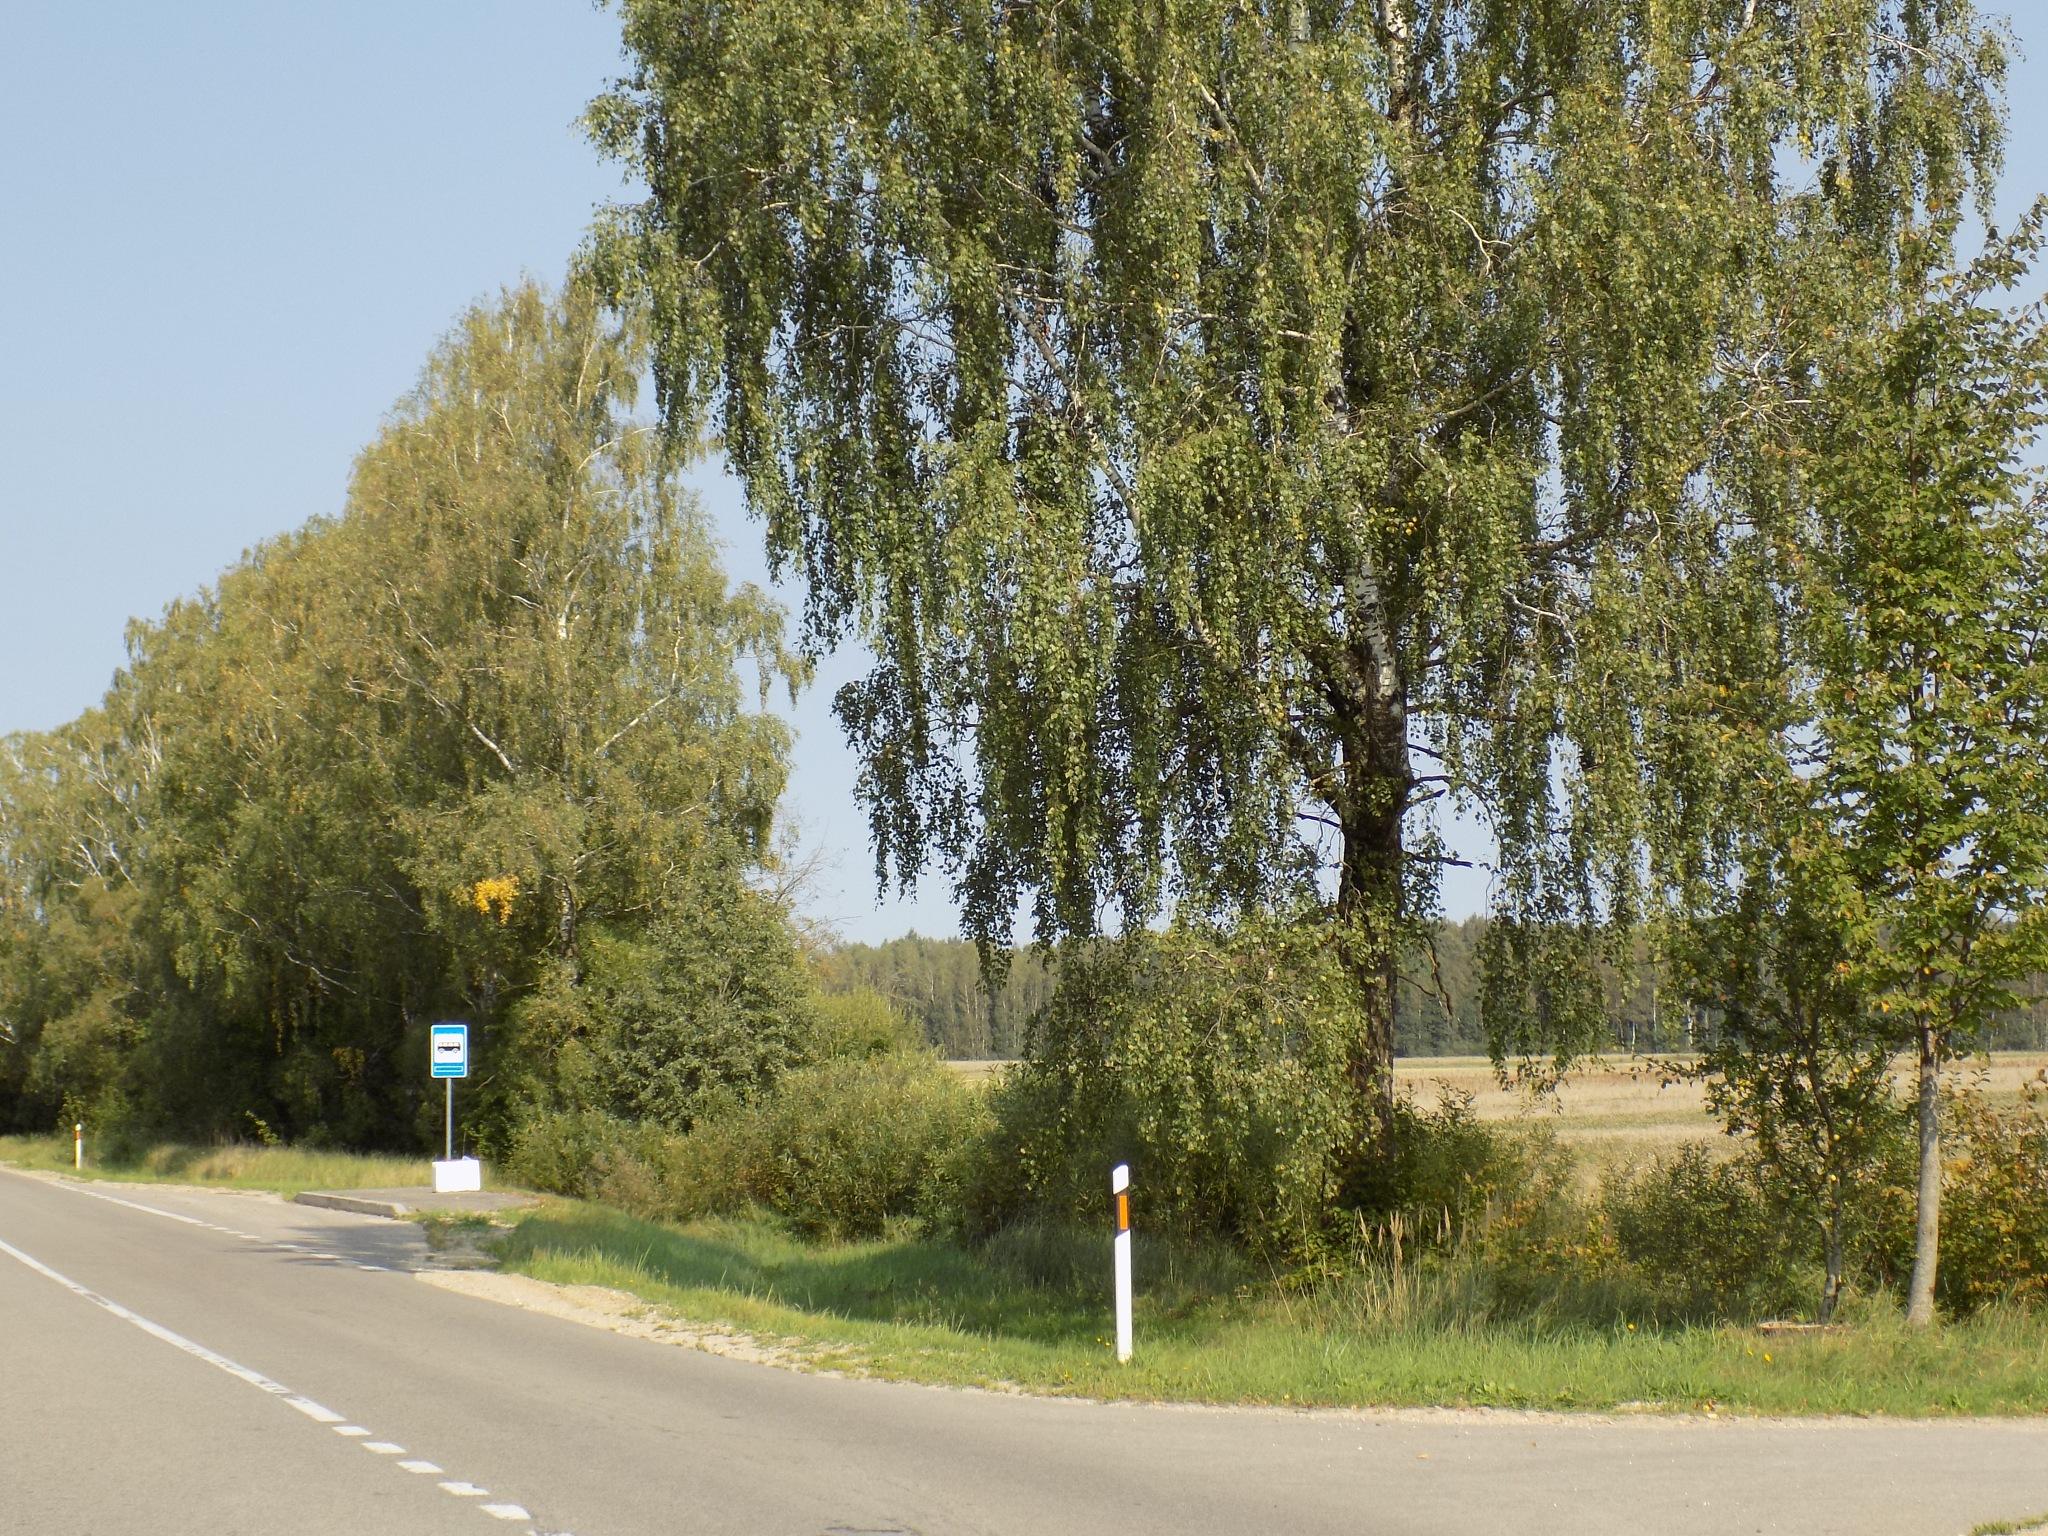 Trees near the road. by uzkuraitiene62